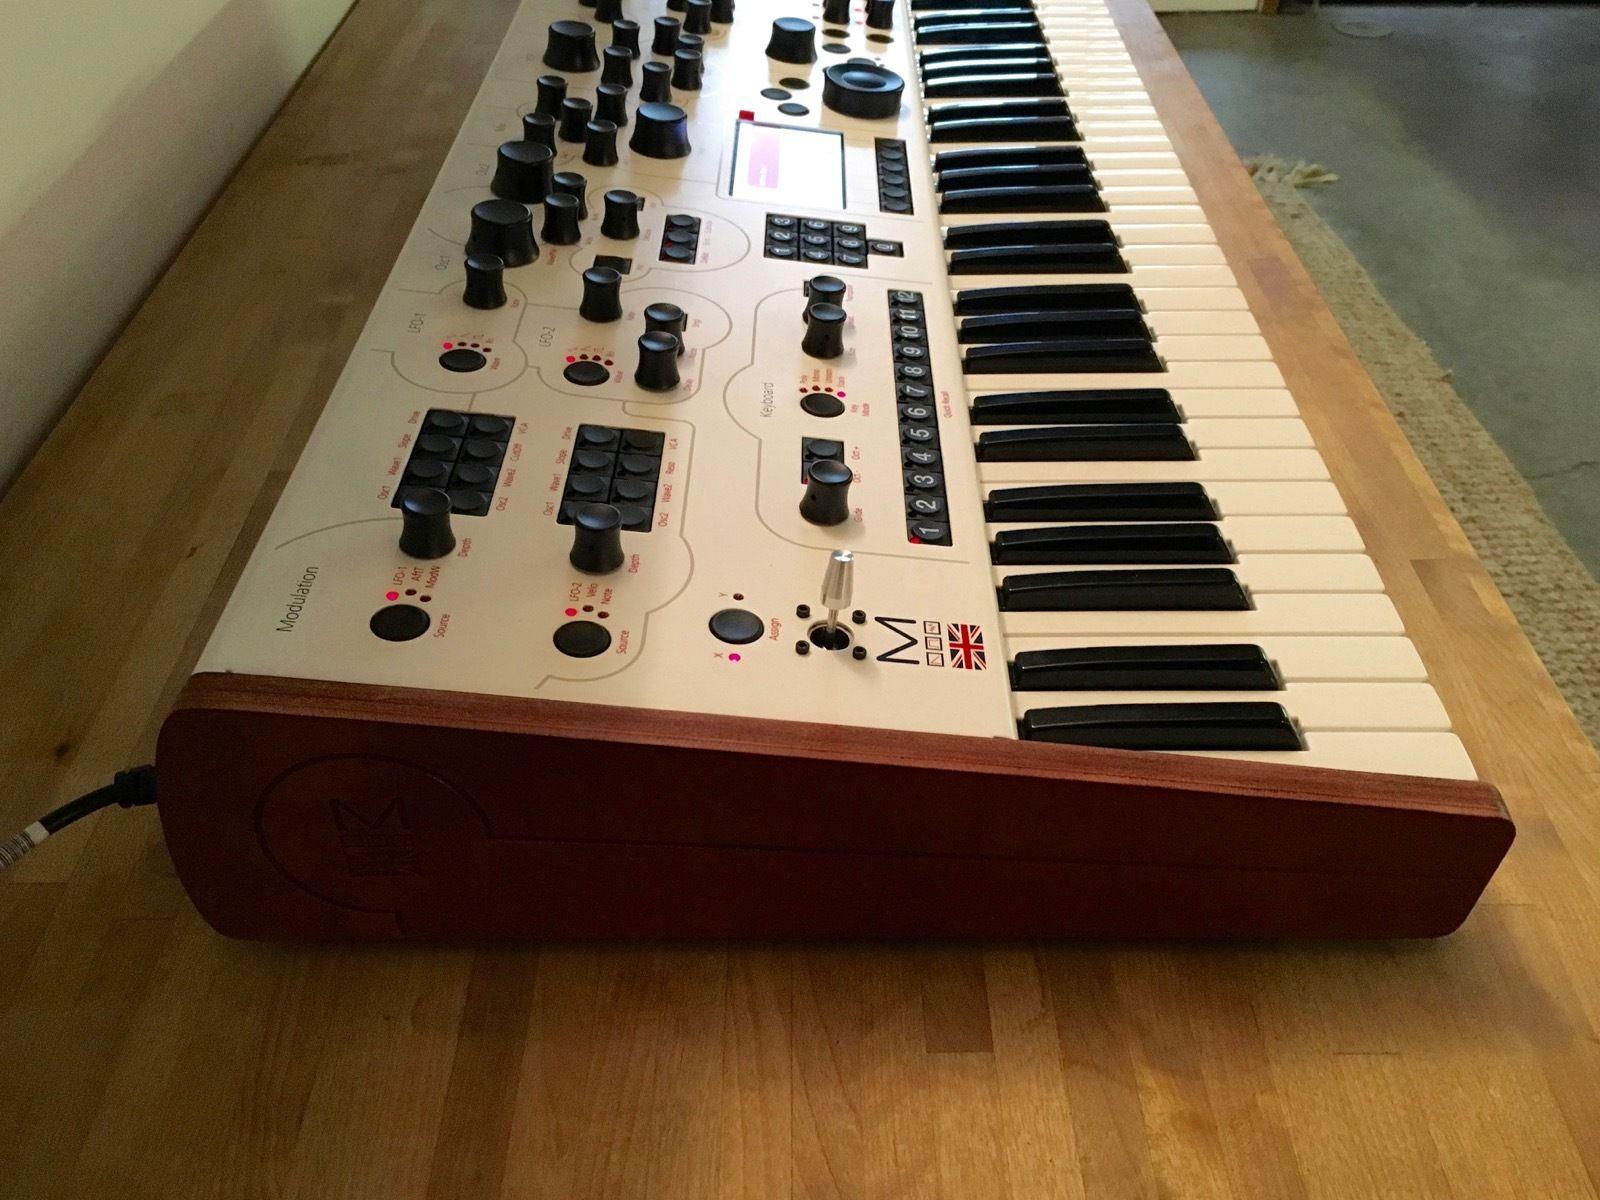 matrixsynth modal electronics 002 12 voice digital analogue hybrid synthesizer. Black Bedroom Furniture Sets. Home Design Ideas